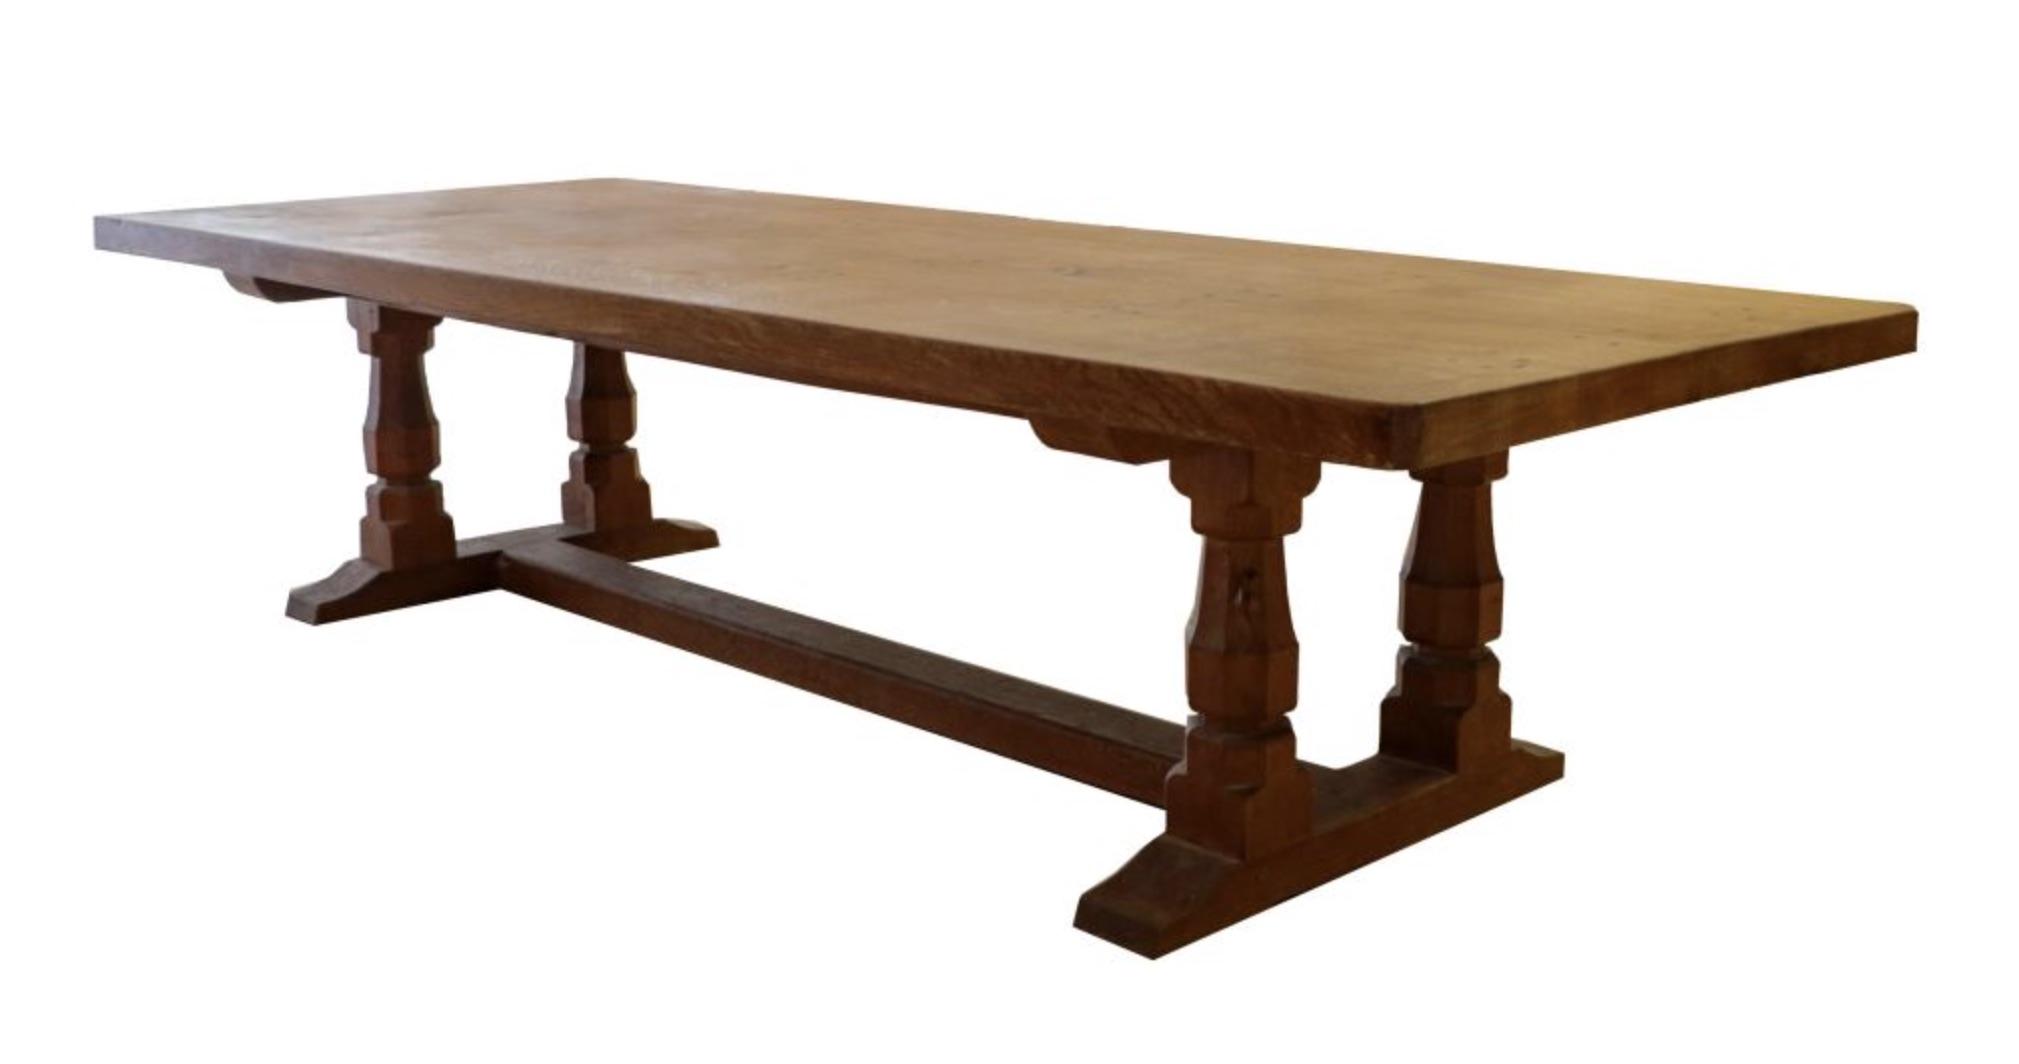 Robert 'Mouseman' Thompson Refectory Table